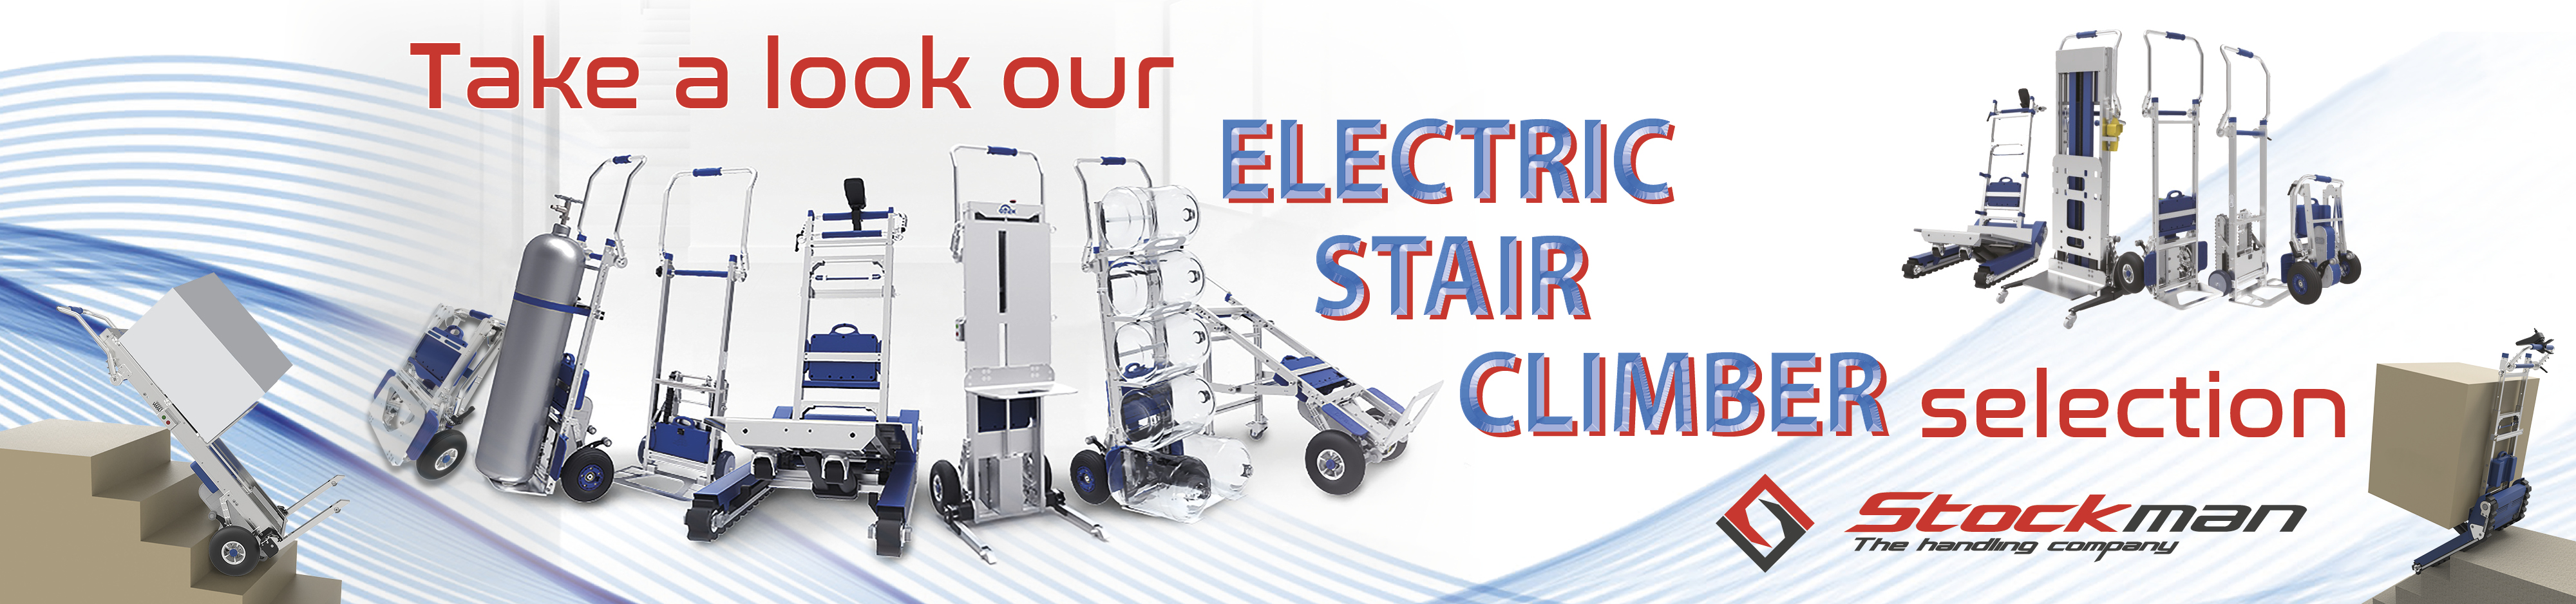 https://www.stockman.fr/sack-trucks-trolleys--6/electric-stair-climber-sack-trucks--33.aspx